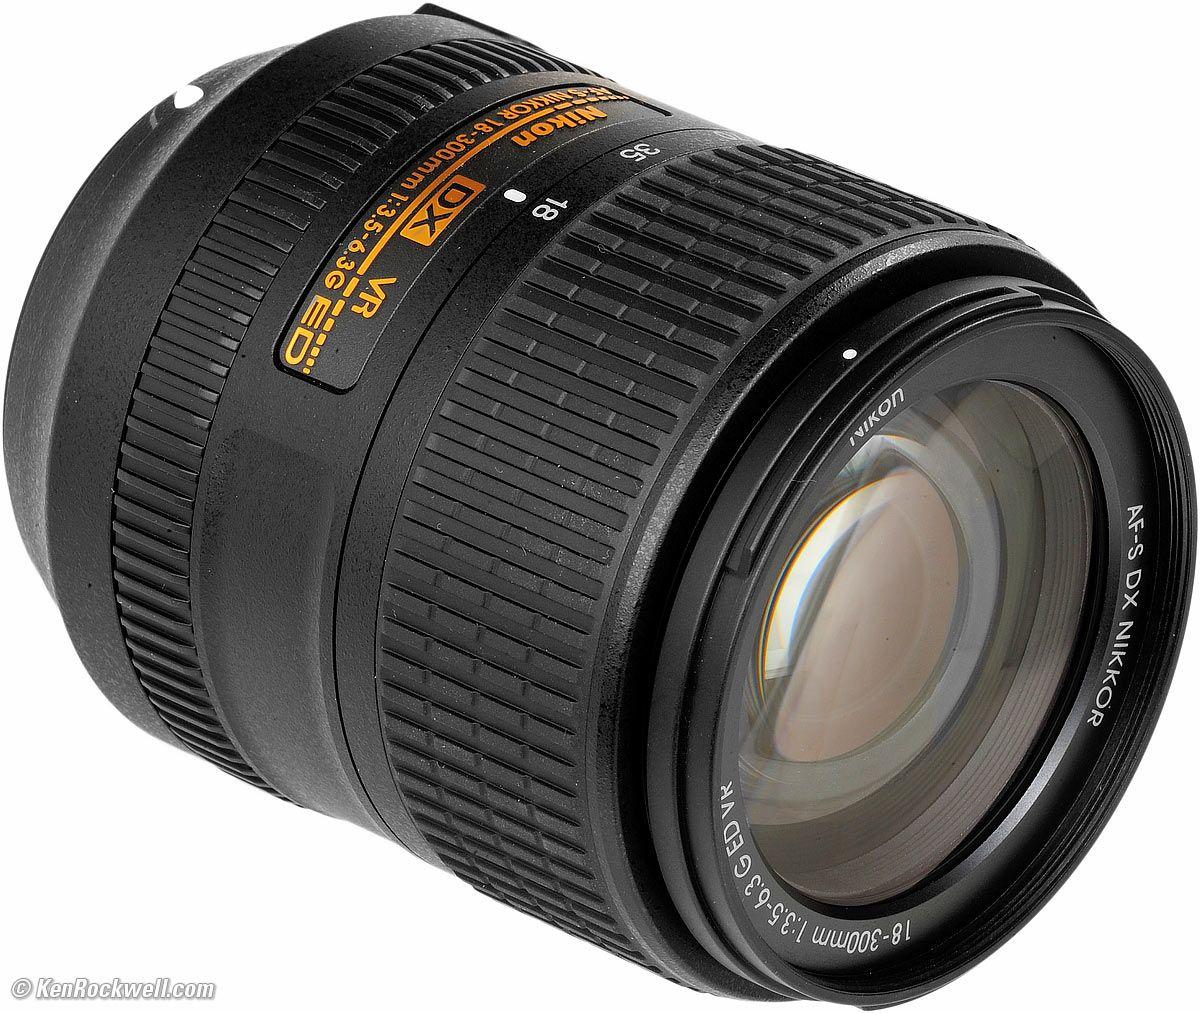 Best Nikon Lenses In 2020 Nikon Lenses Nikon D90 Camera Nikon